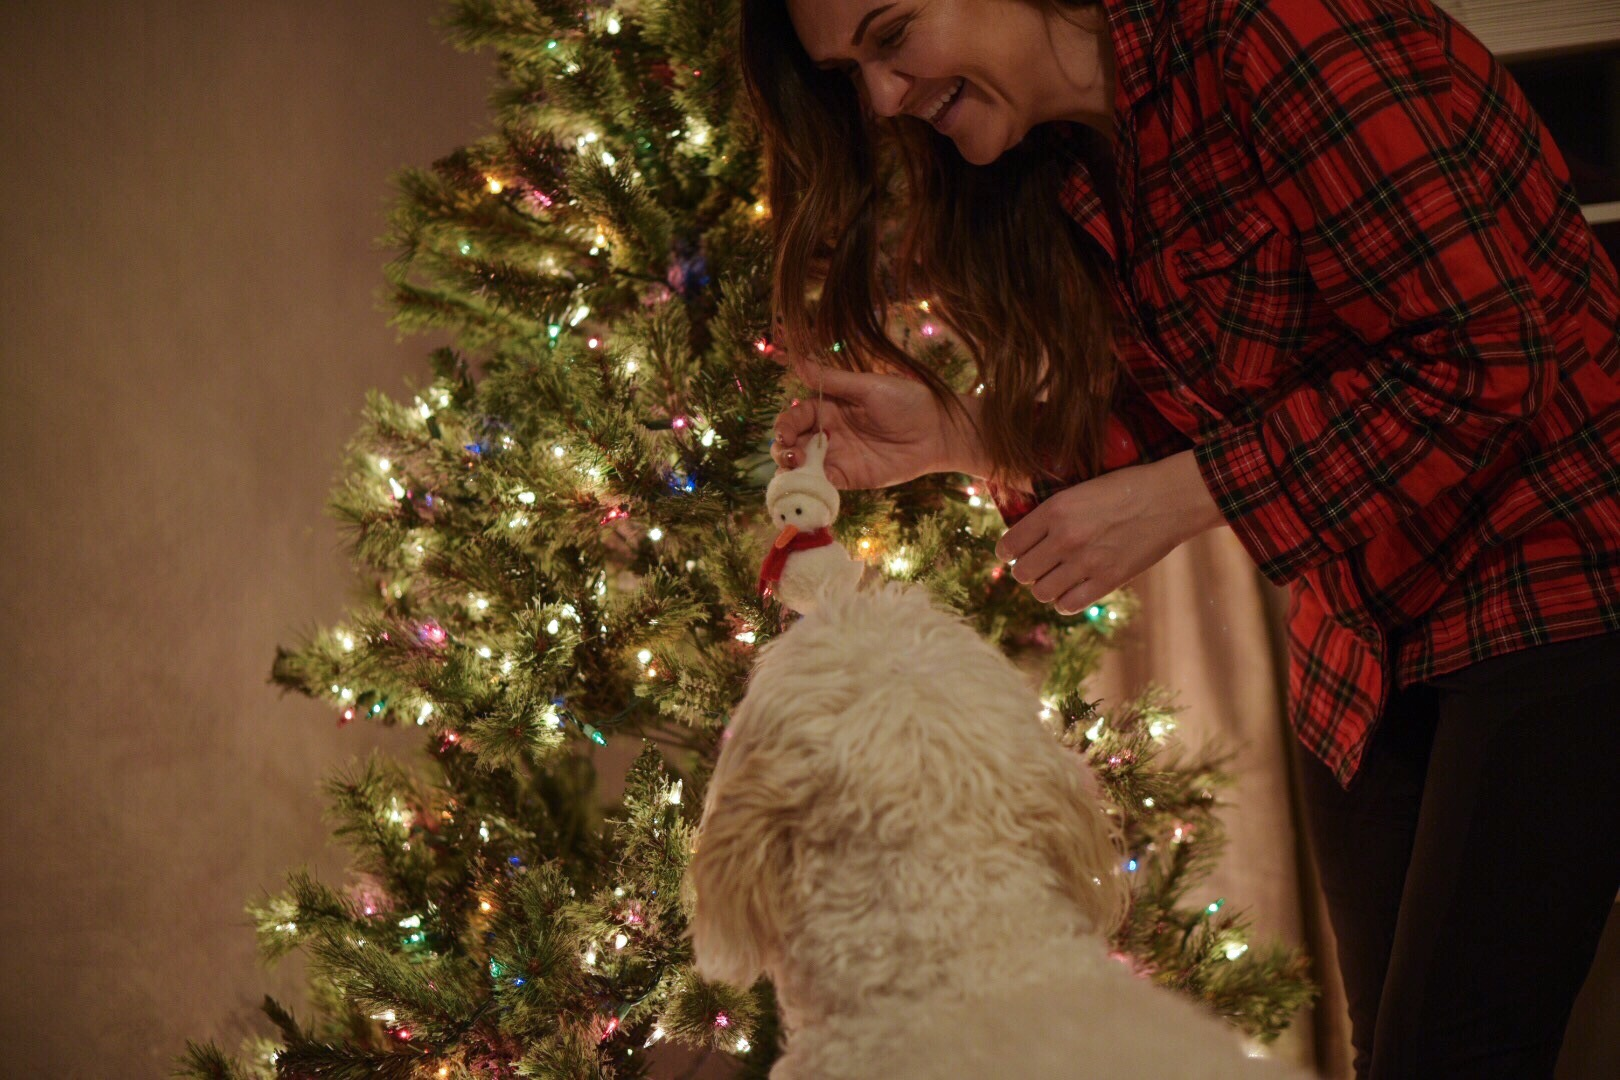 christmas-tree-decorating-with-dog.jpg